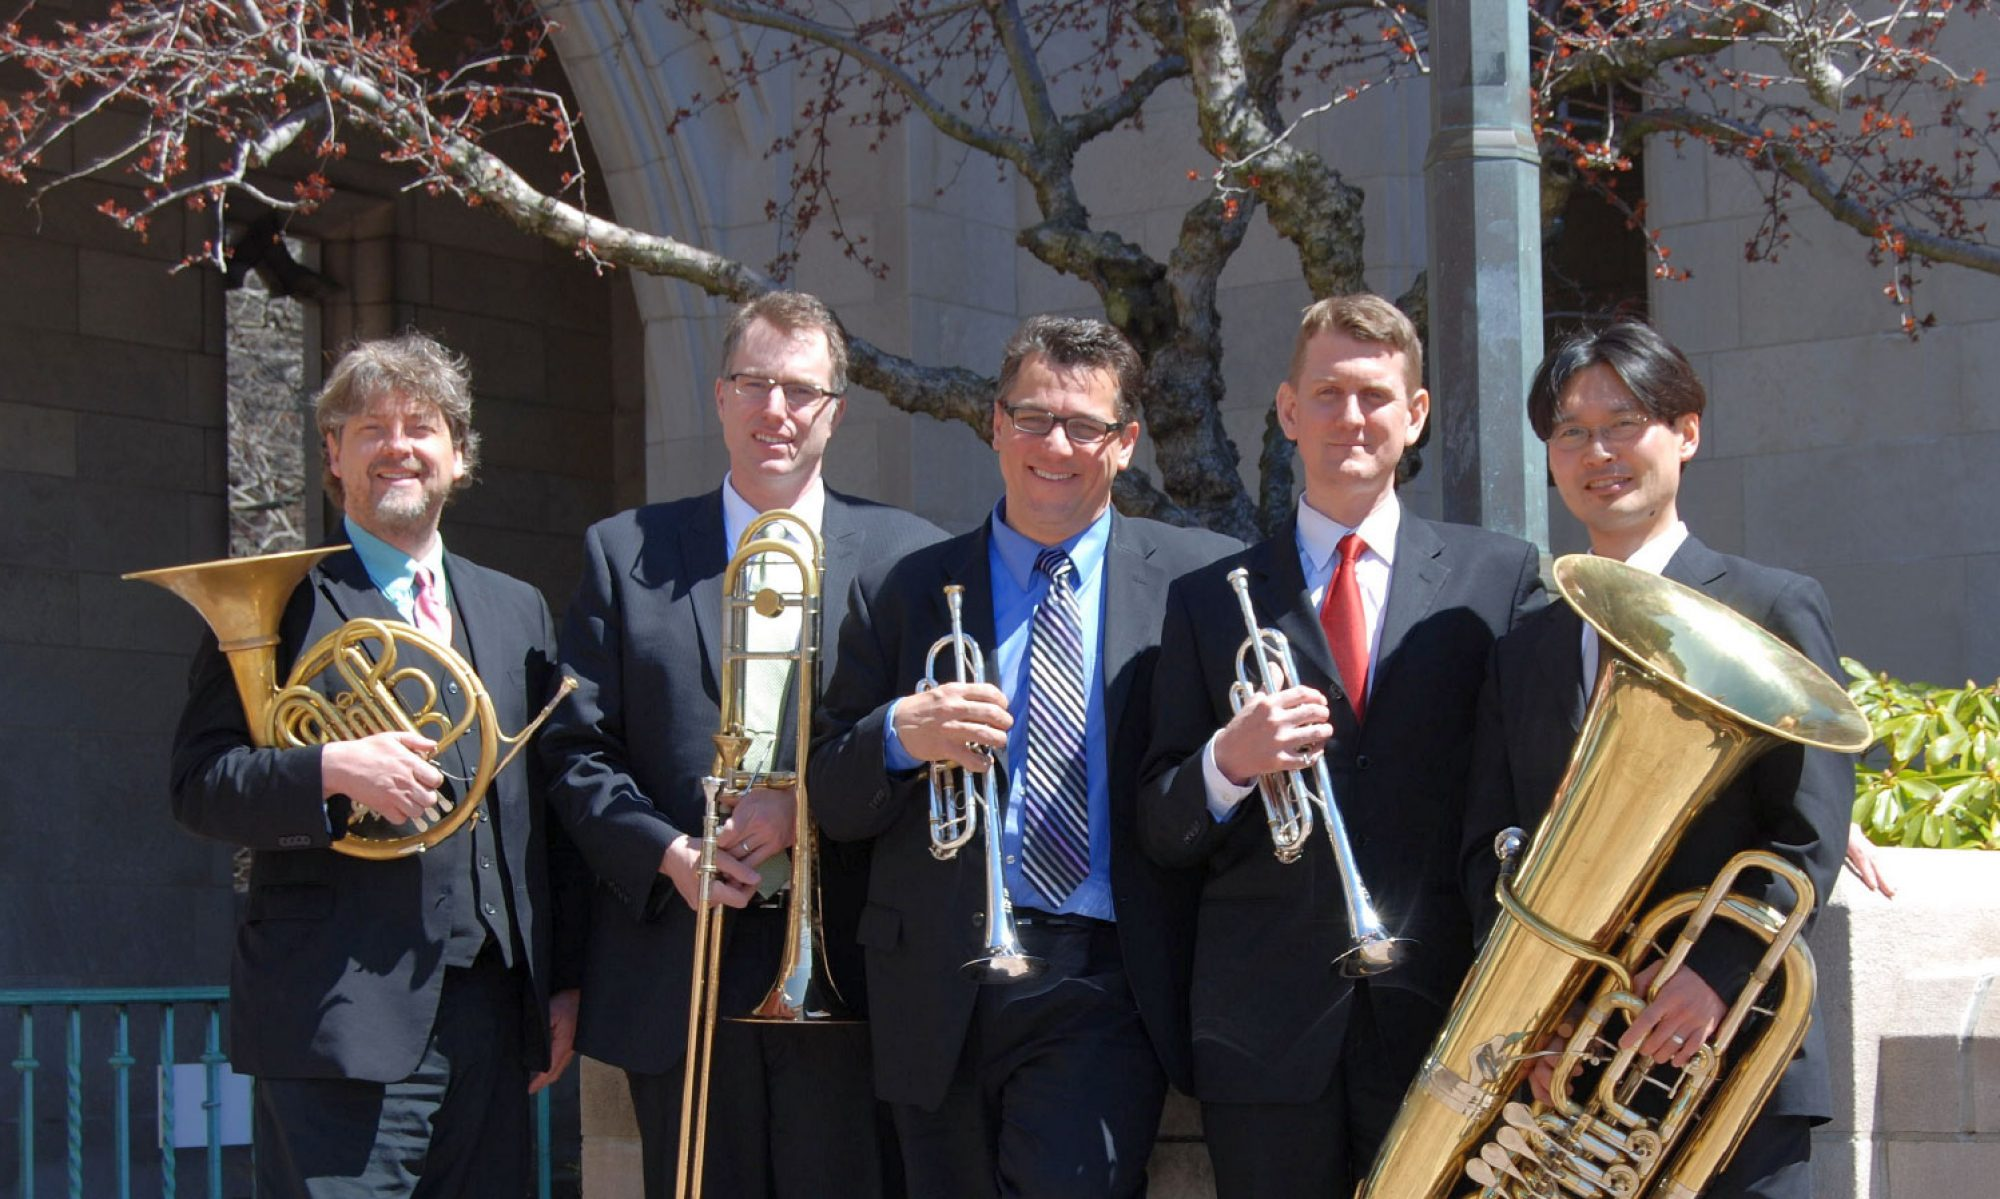 Majestic Brass Quintet